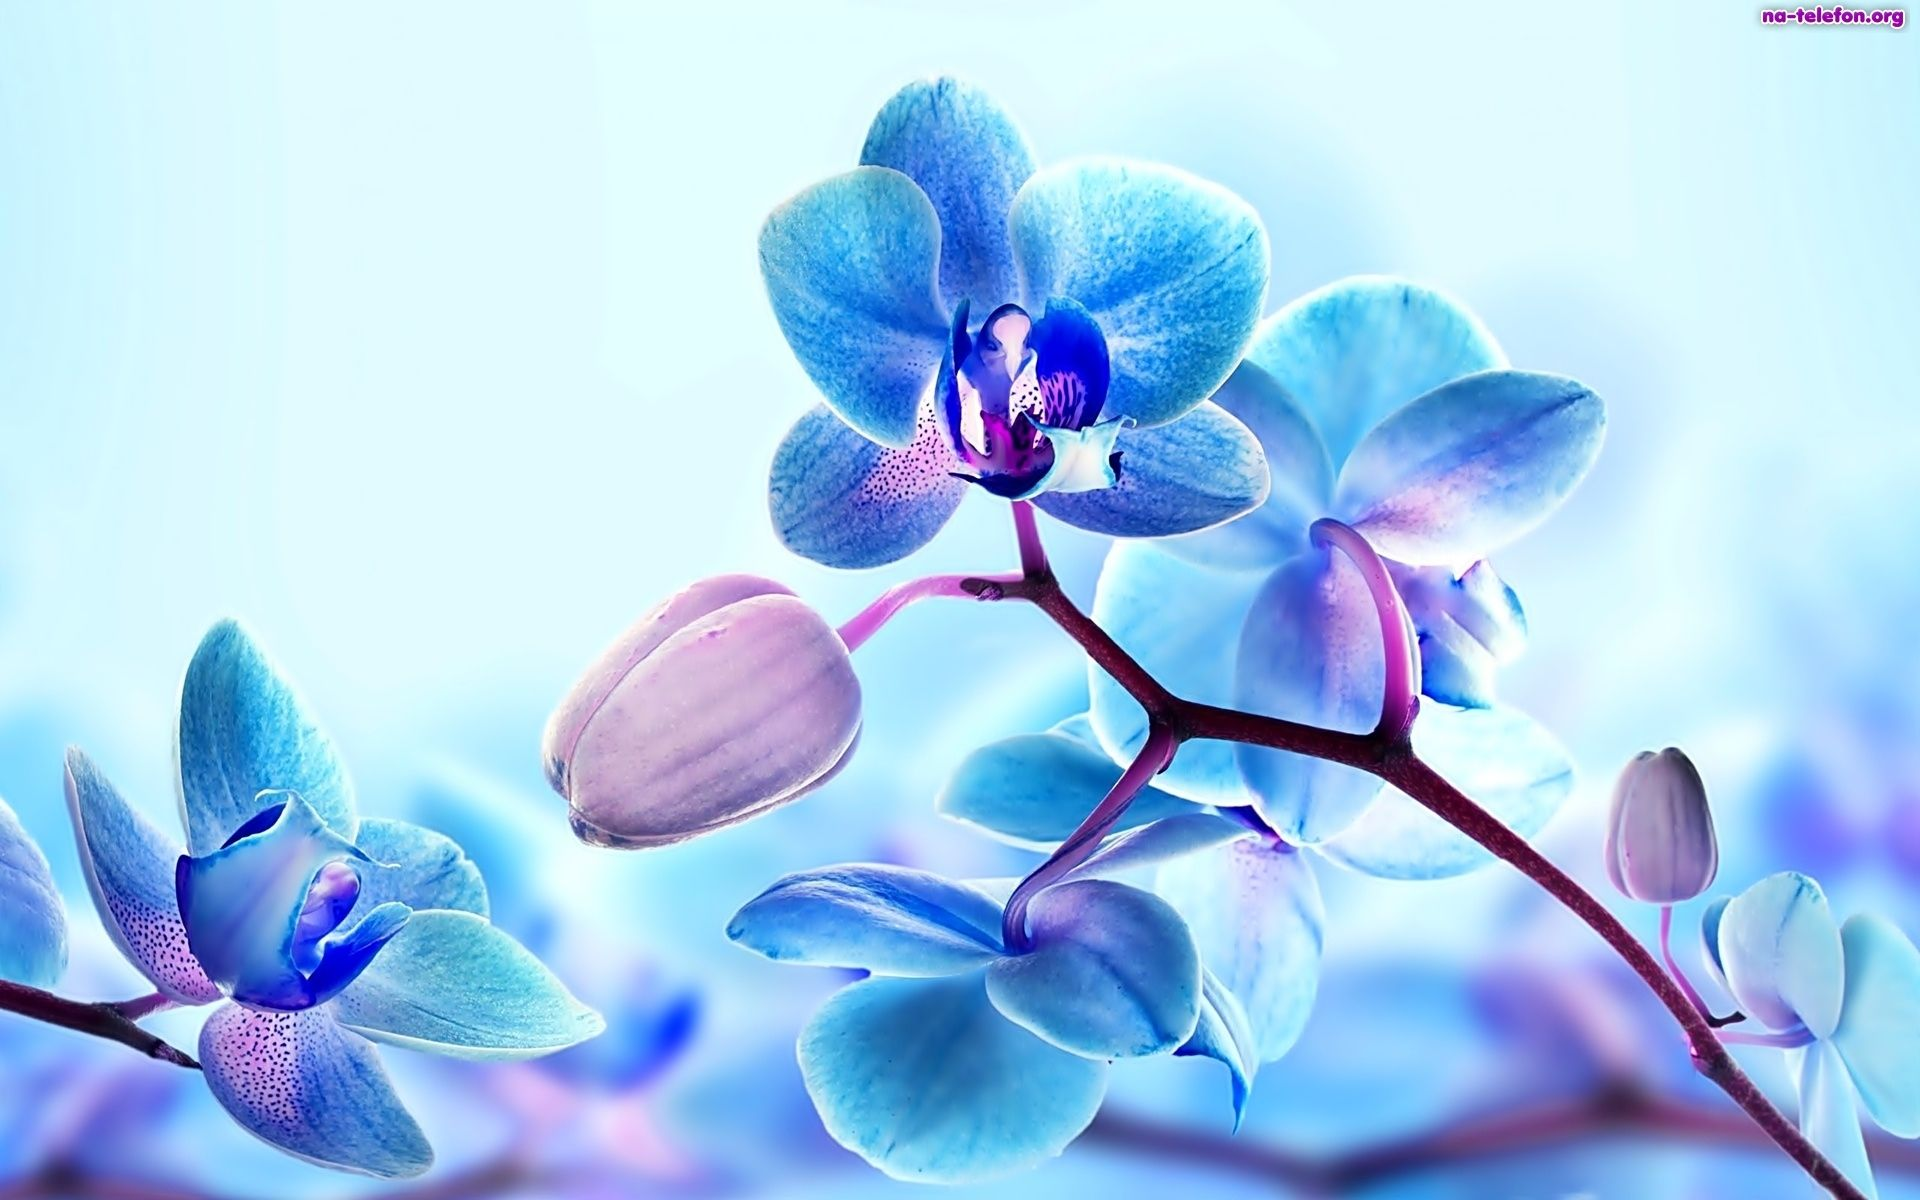 Storczyki Na Telefon Orchid Wallpaper Blue Orchid Flower Blue Orchids